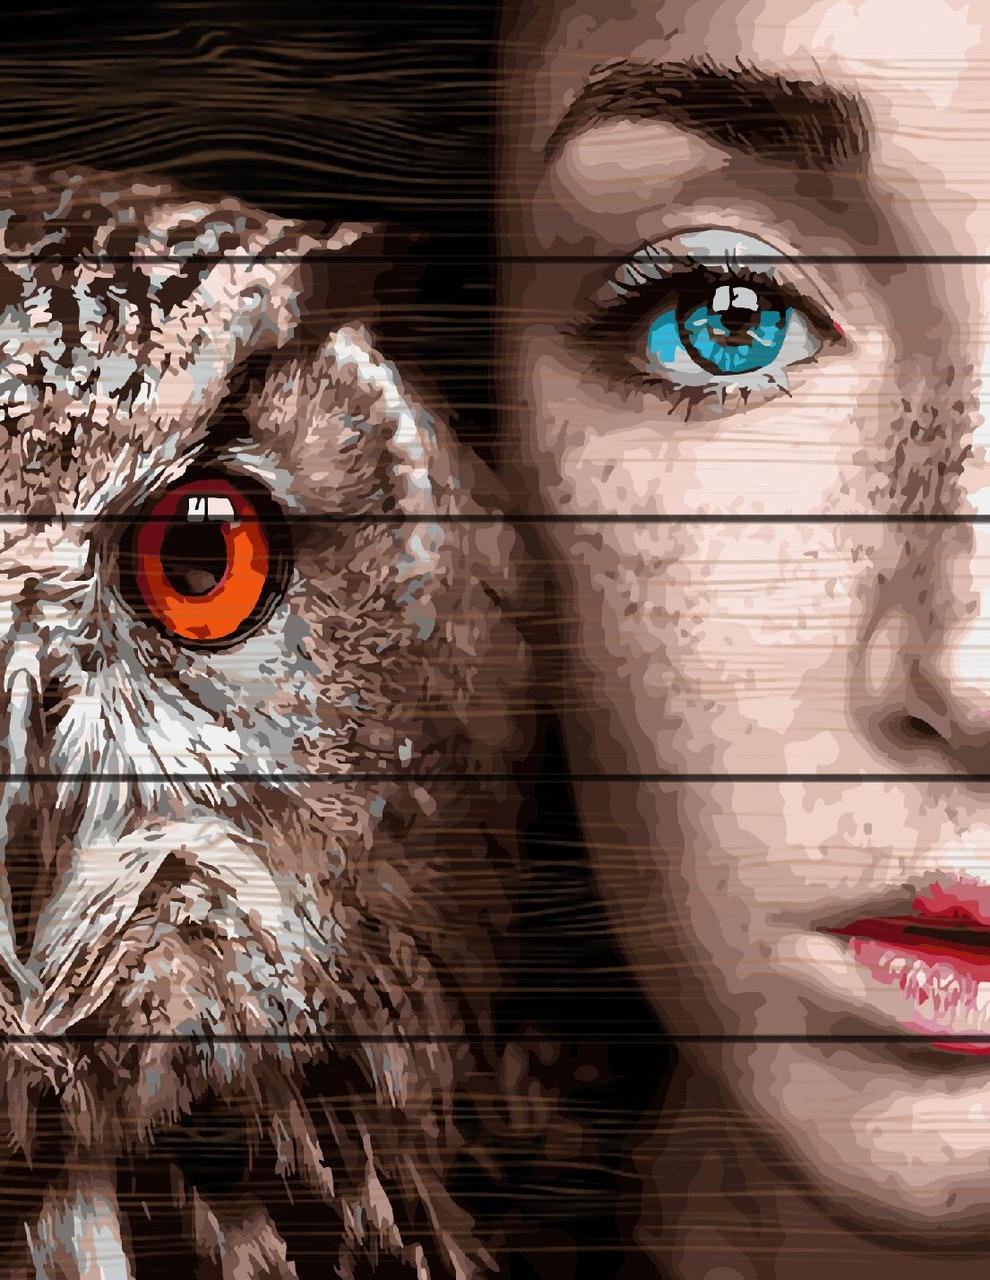 RA-GXT30916 Раскраска по номерам на деревяной основе Девушка и сова